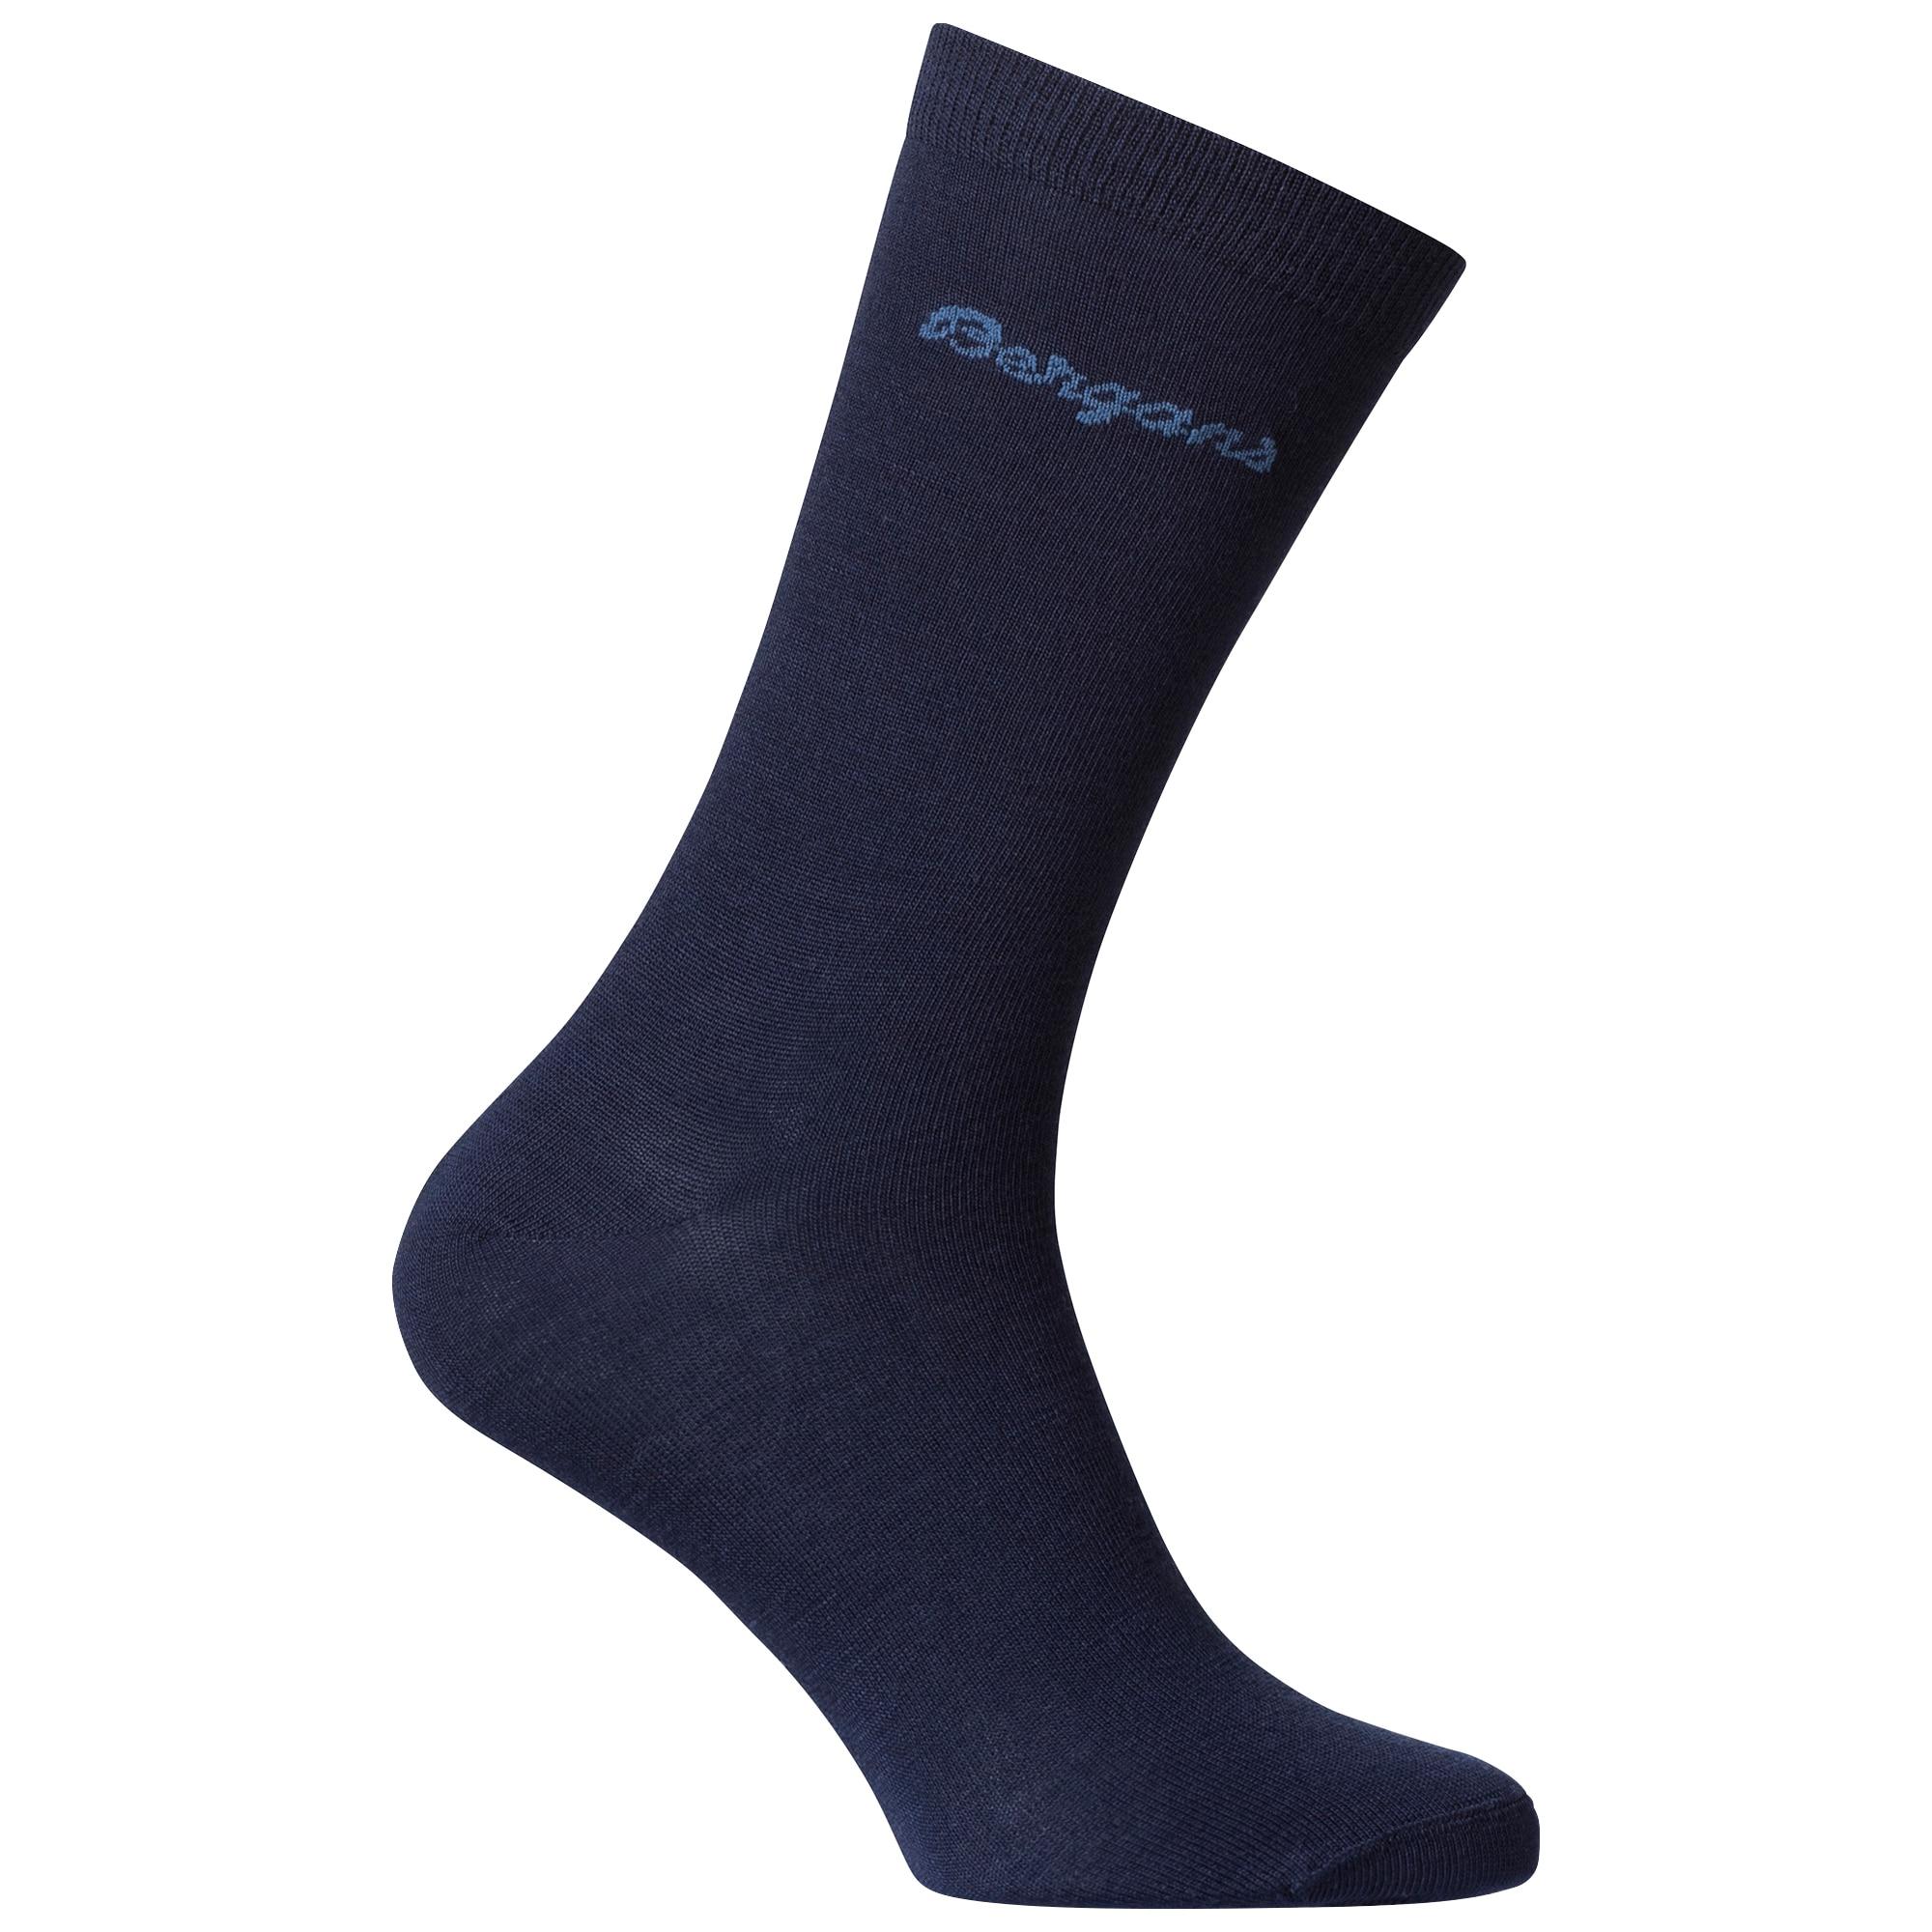 Viul Wool Liner Socks